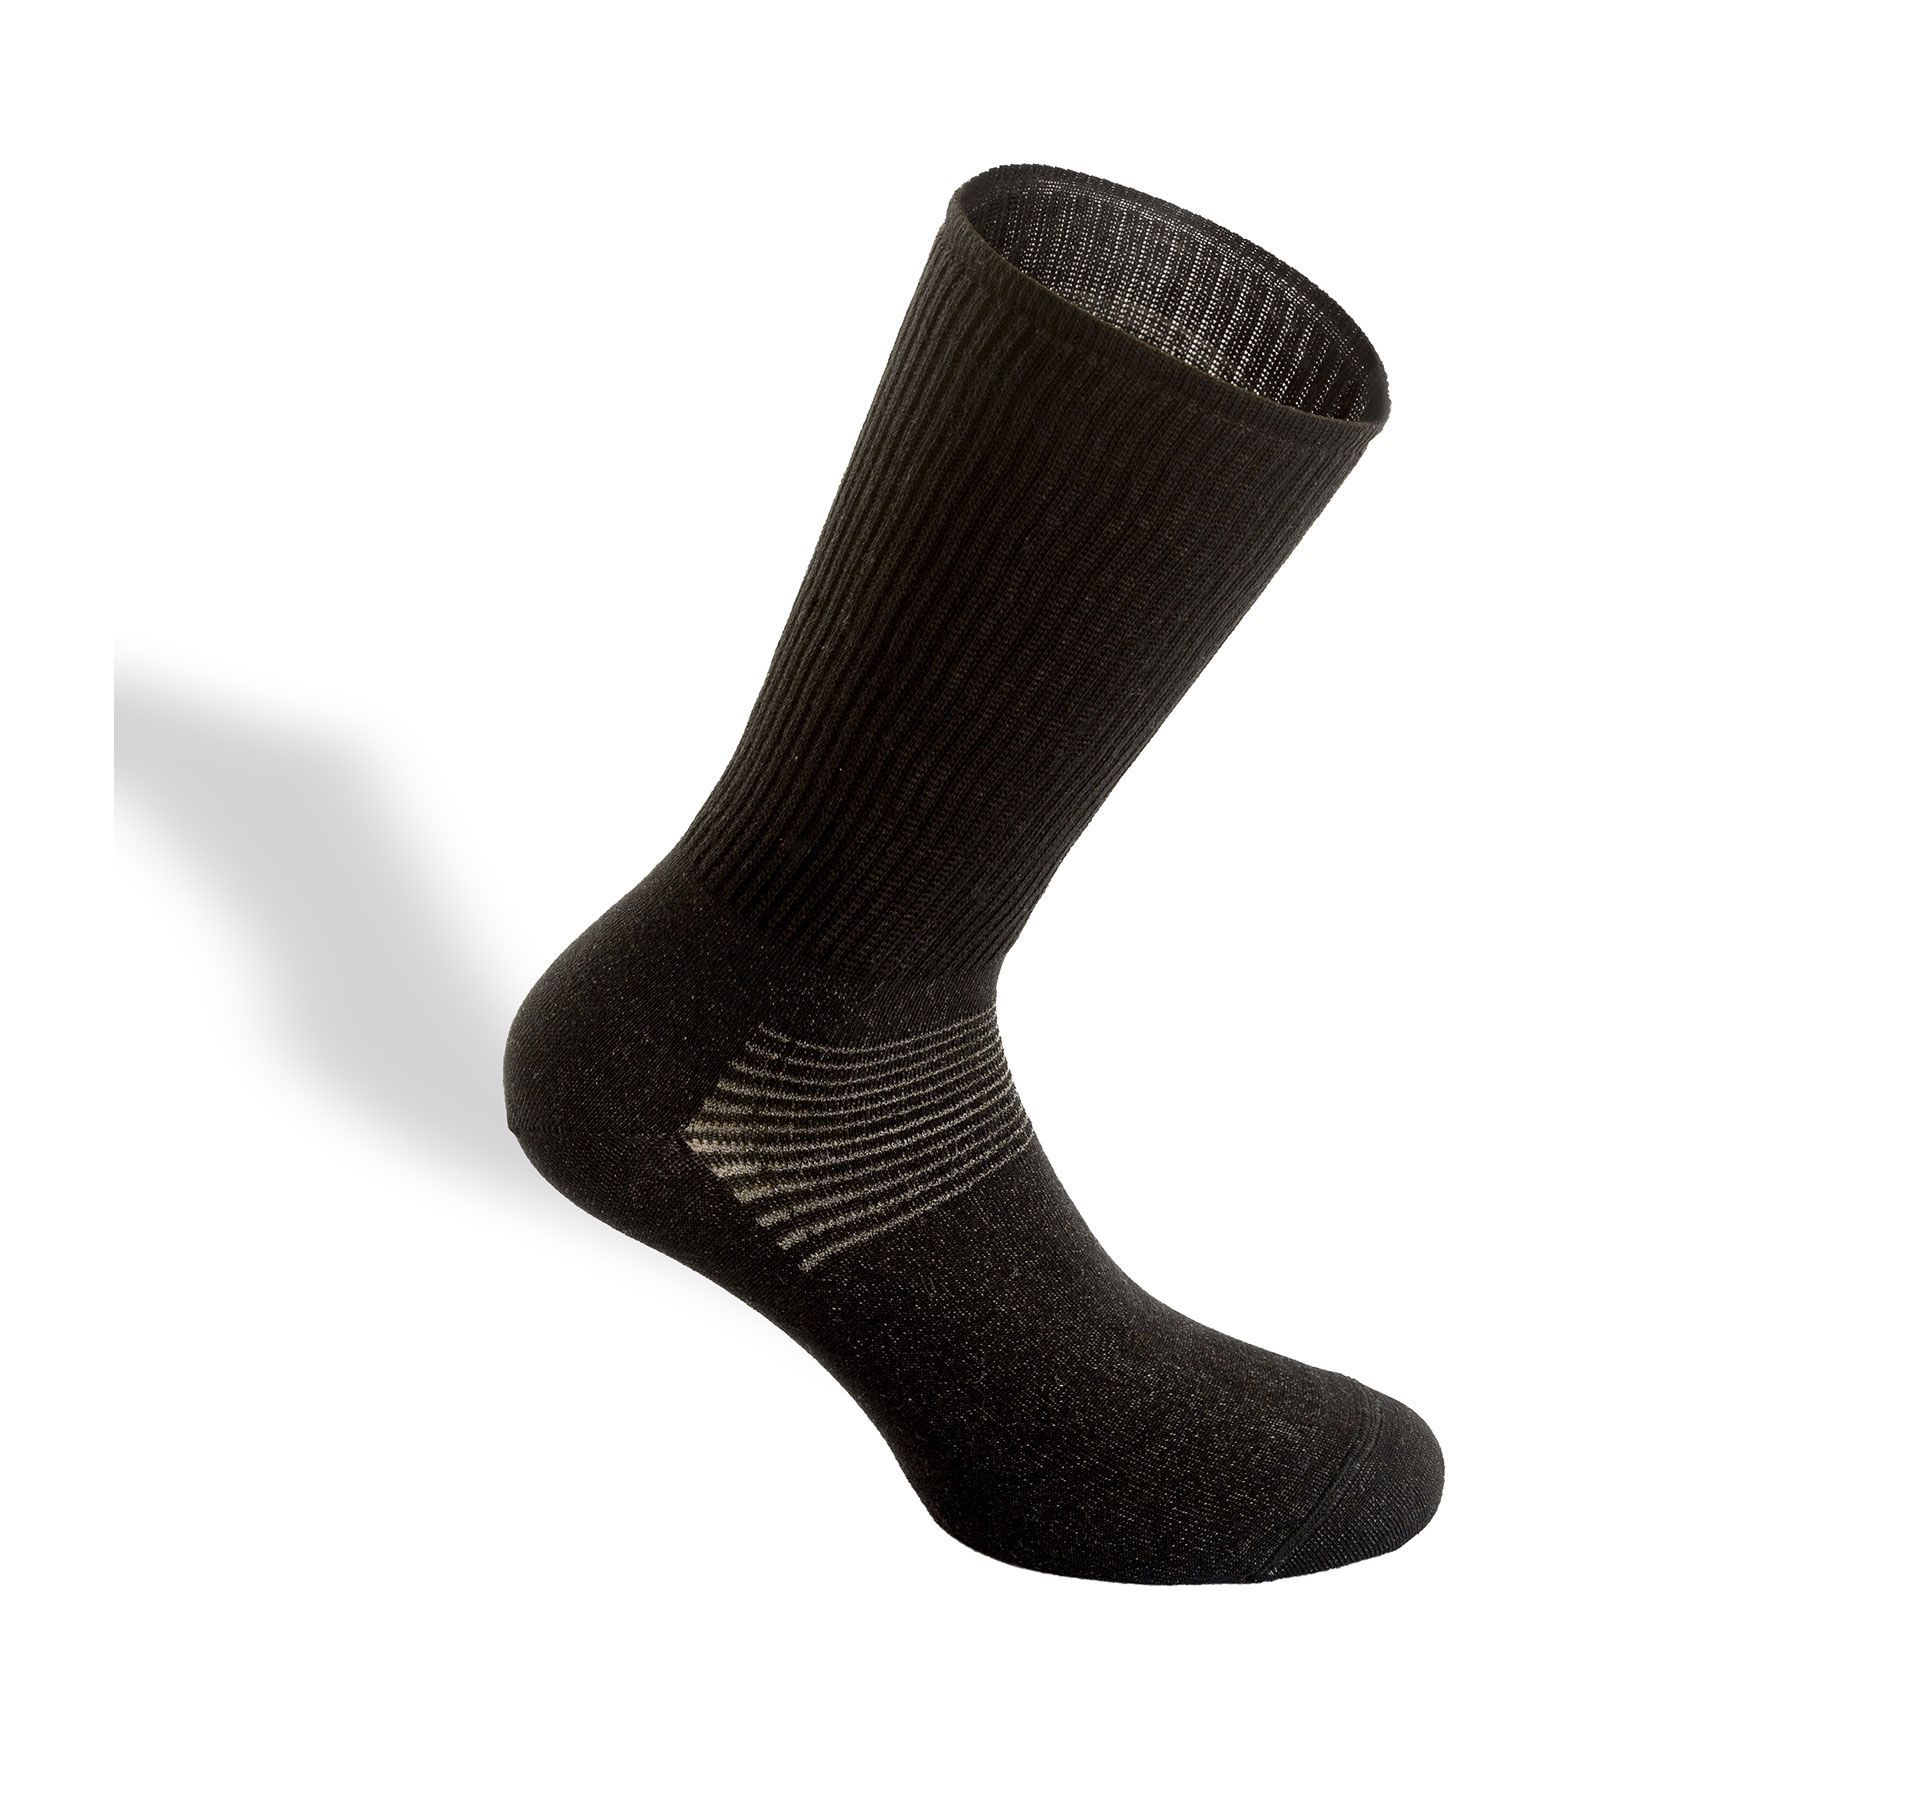 calza benefica in fibra d'argento